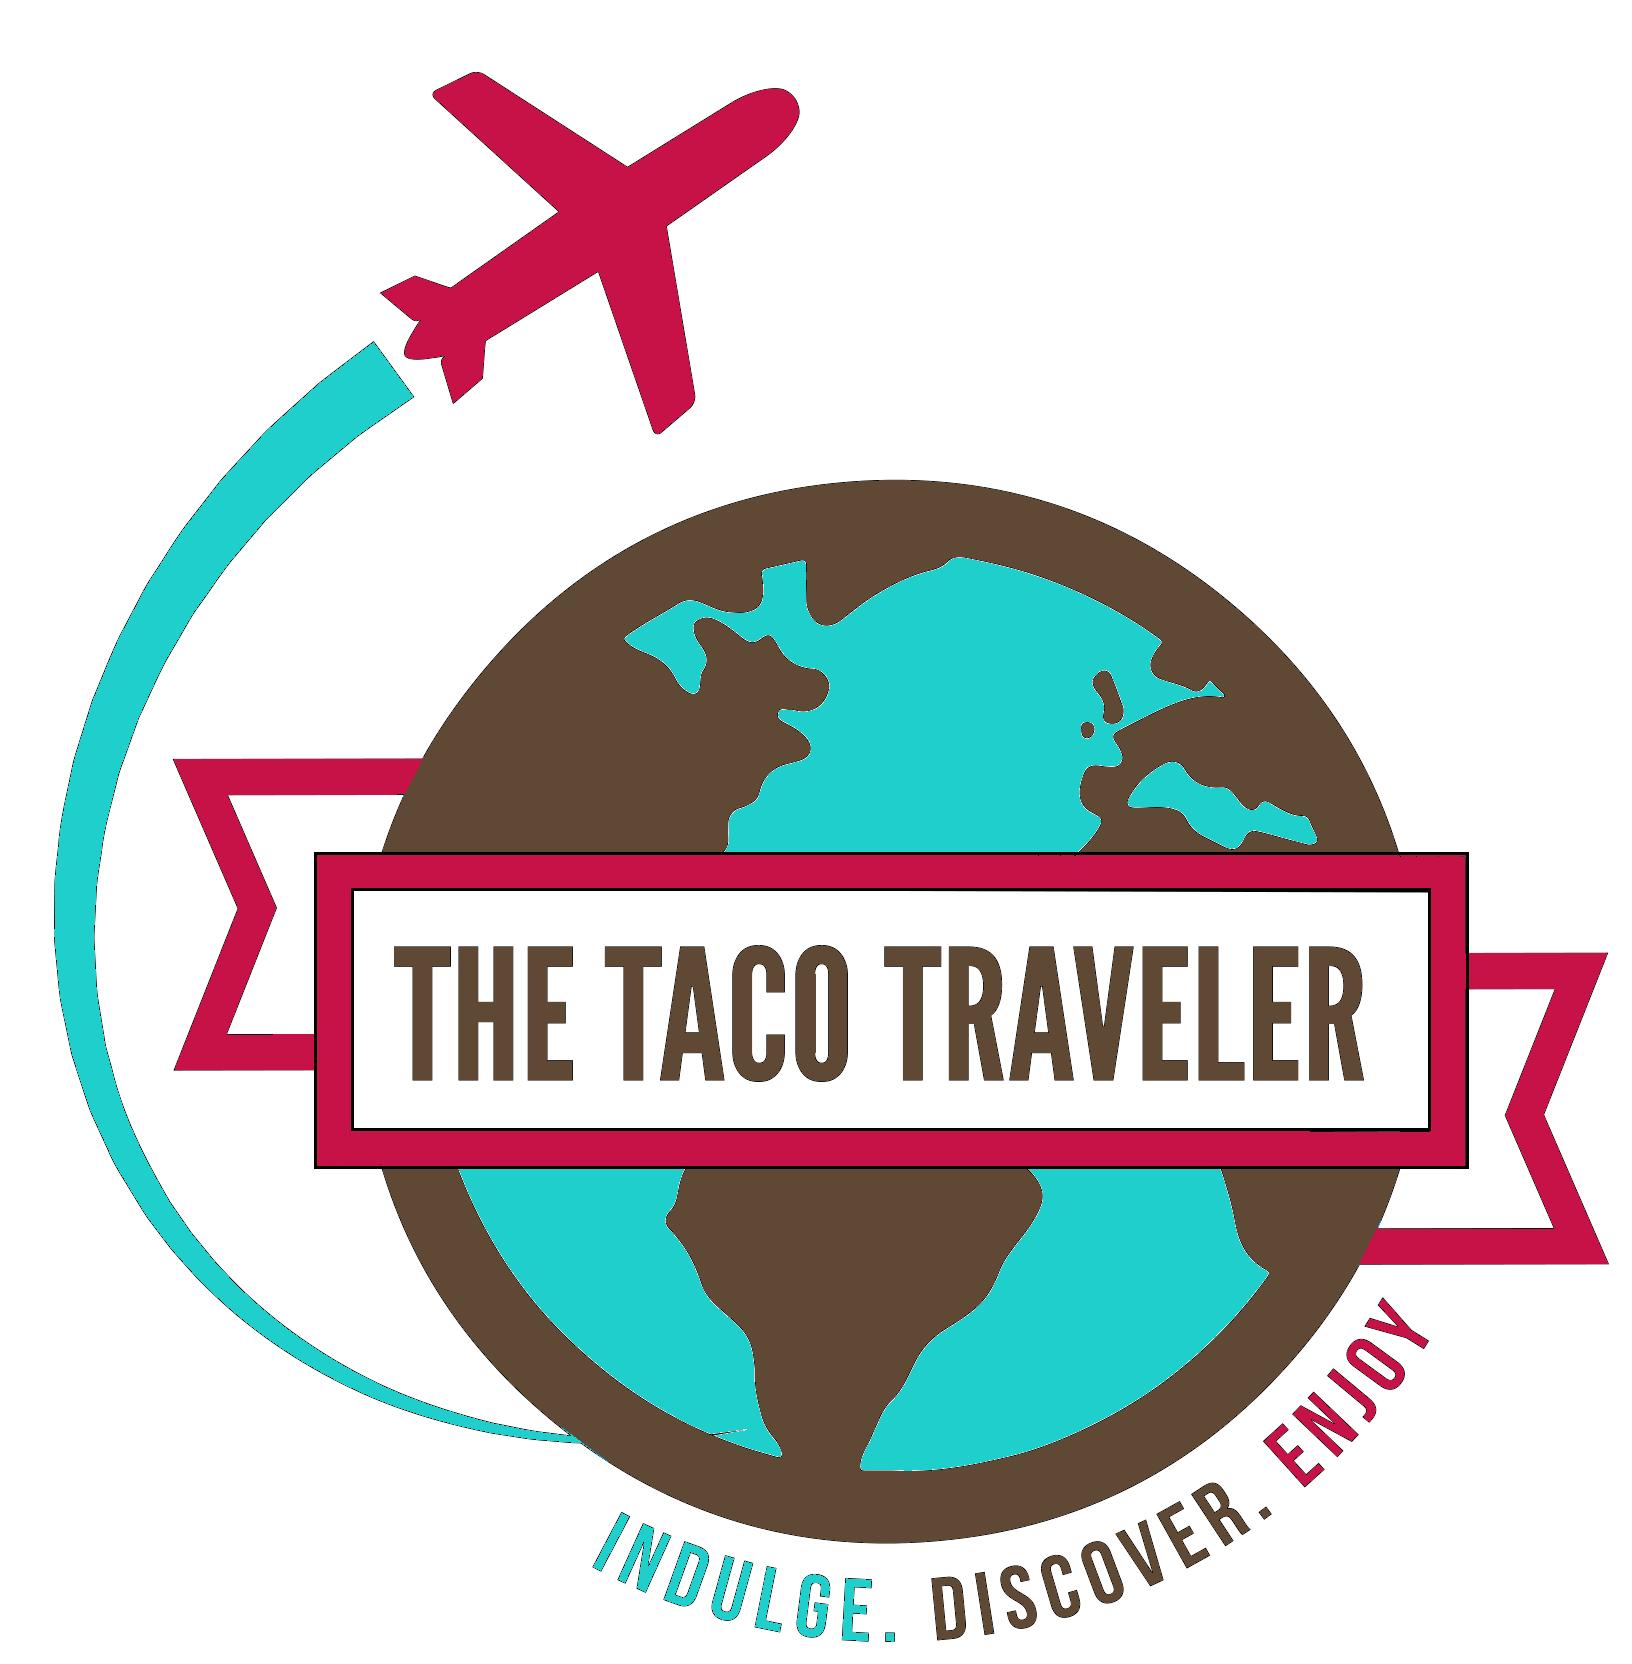 The Taco Traveler